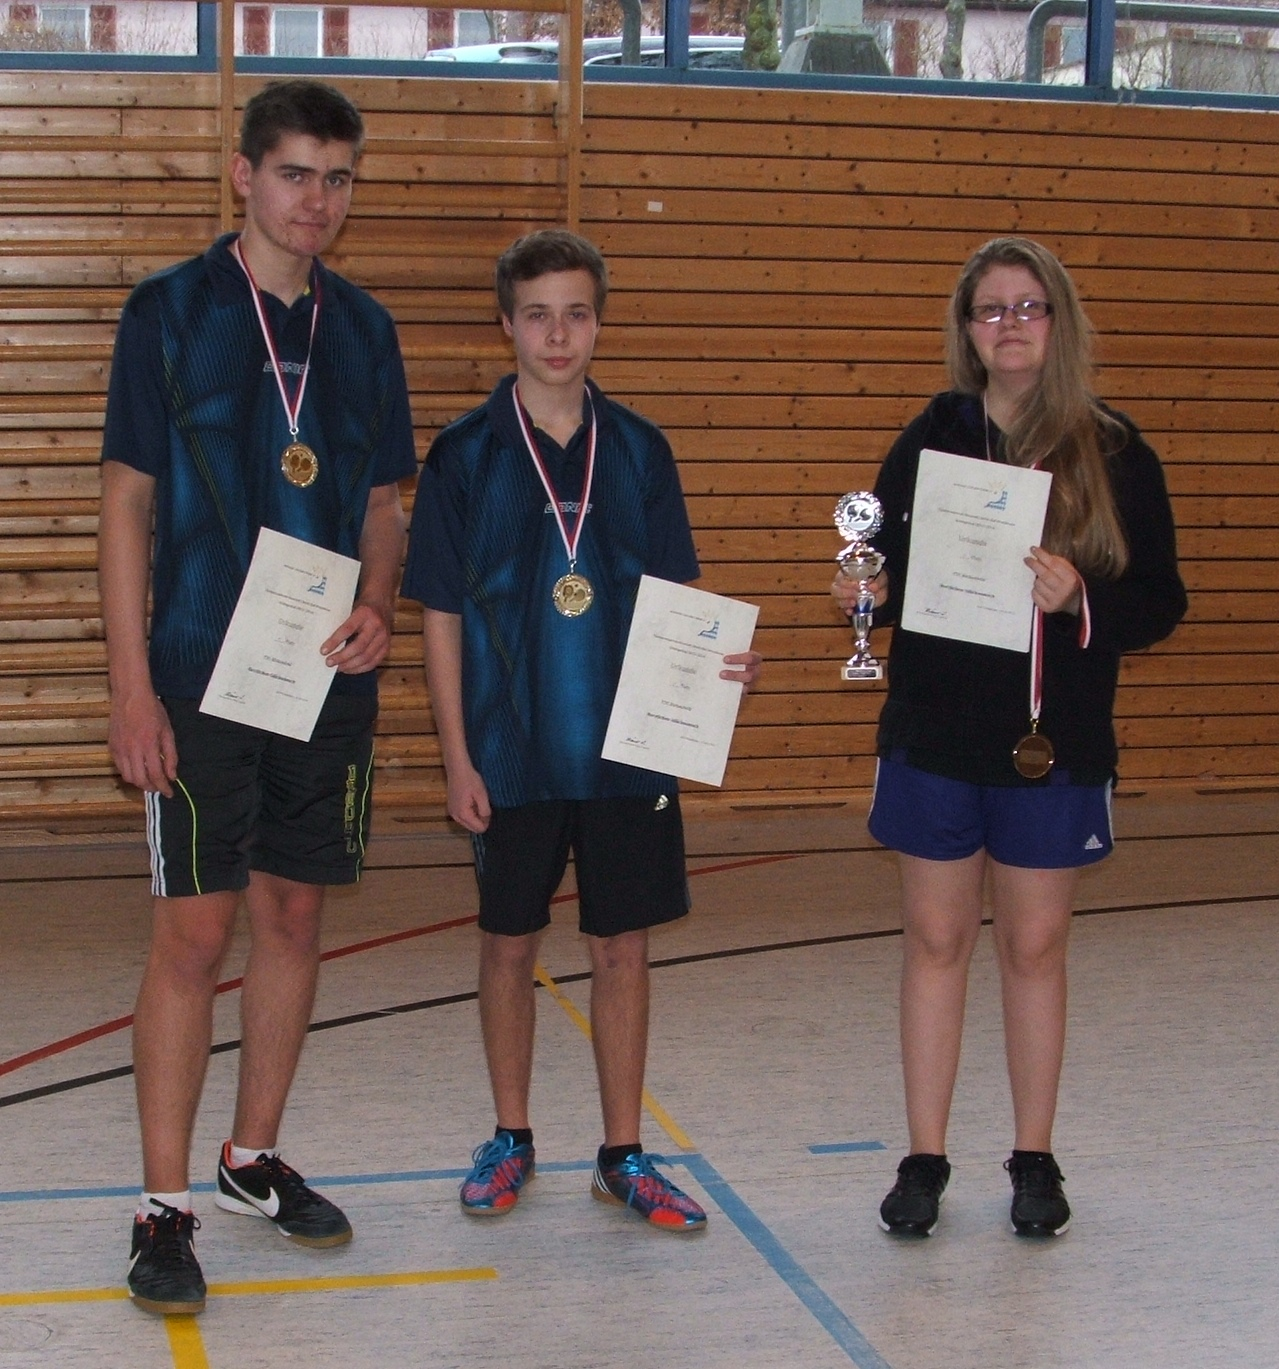 Kreispokalsieger Jugend 2013-2014